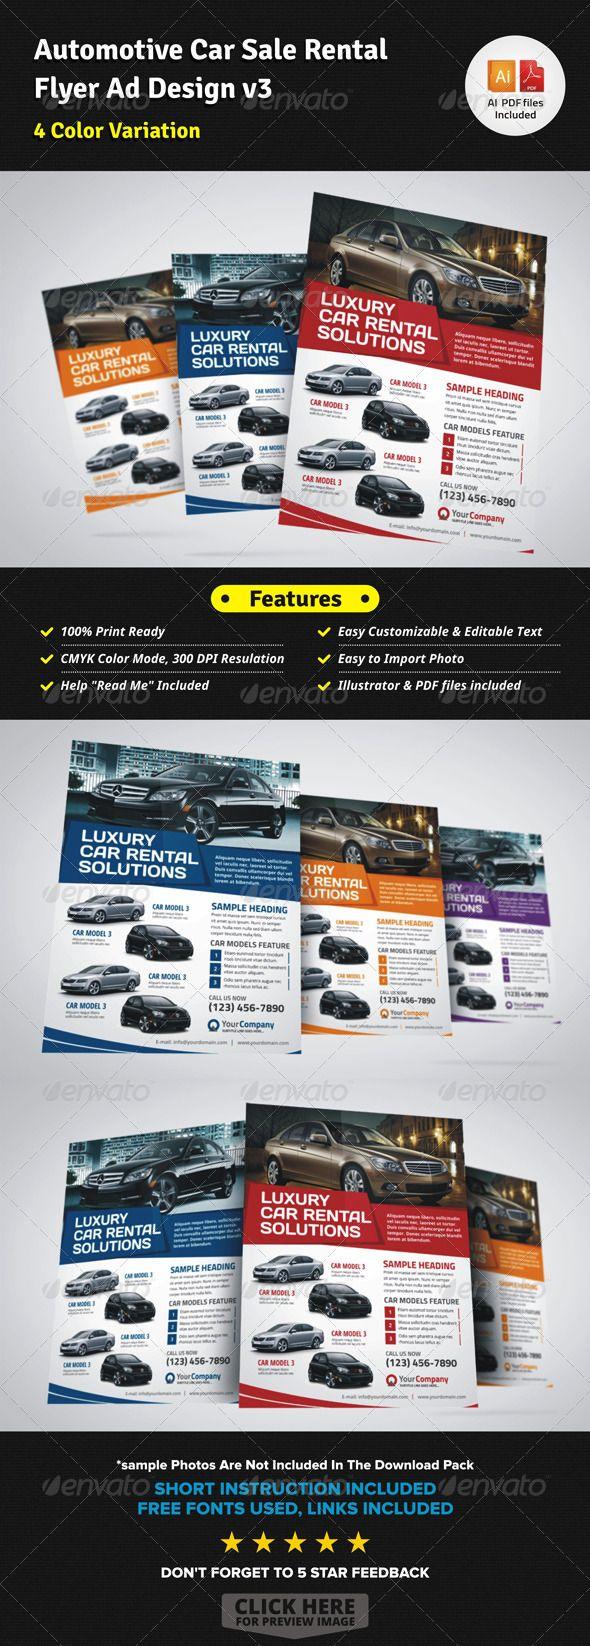 Automotive Car Sale Rental Flyer Ad Template Vol.3